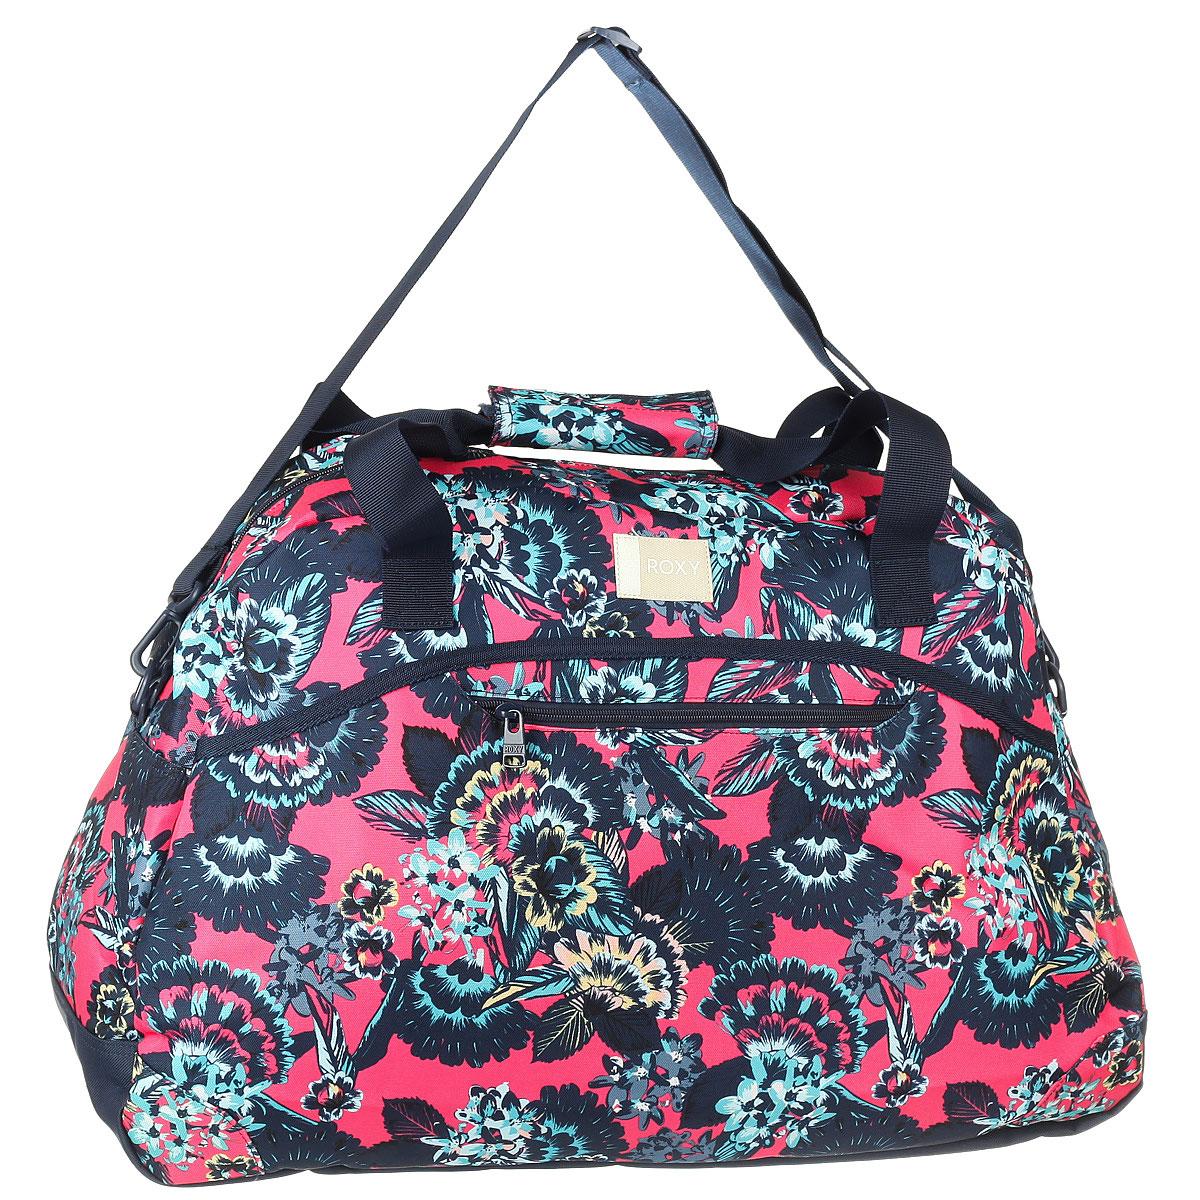 ffb9851447f1 Купить сумку спортивная женскую Roxy Too Far Lugg Rouge Red Mahna ...